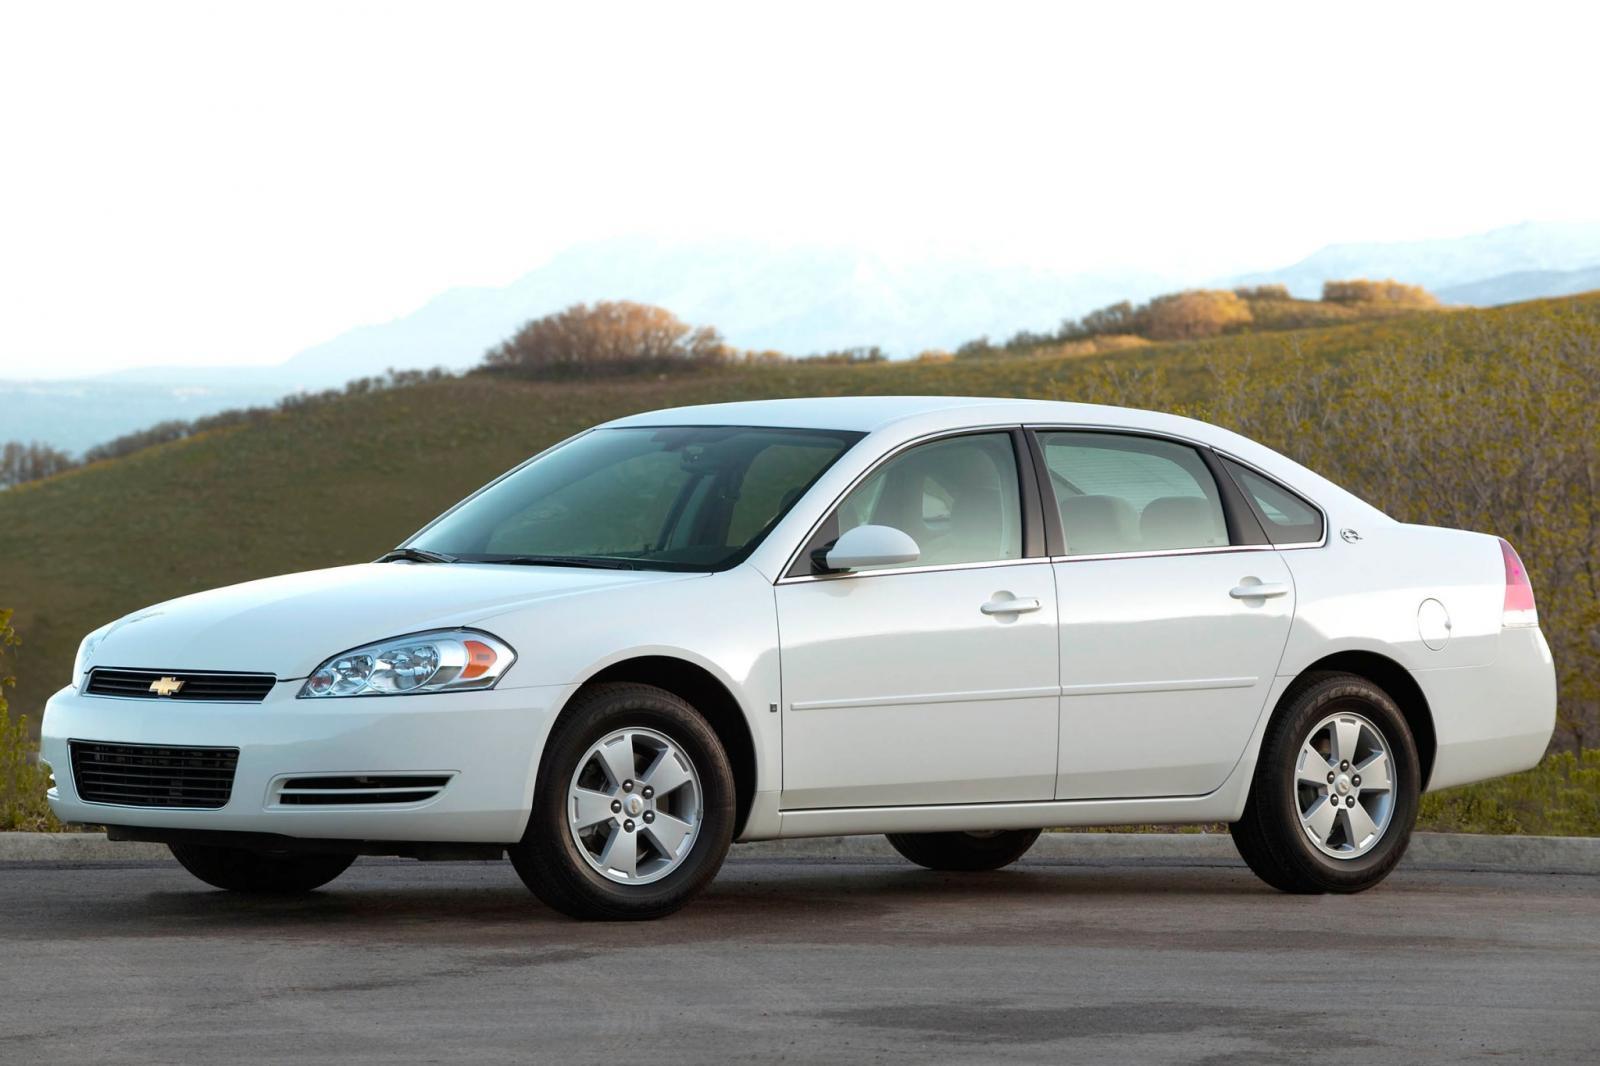 2012 Chevrolet Impala Information And Photos Zombiedrive Engine Diagram 1 800 1024 1280 1600 Origin